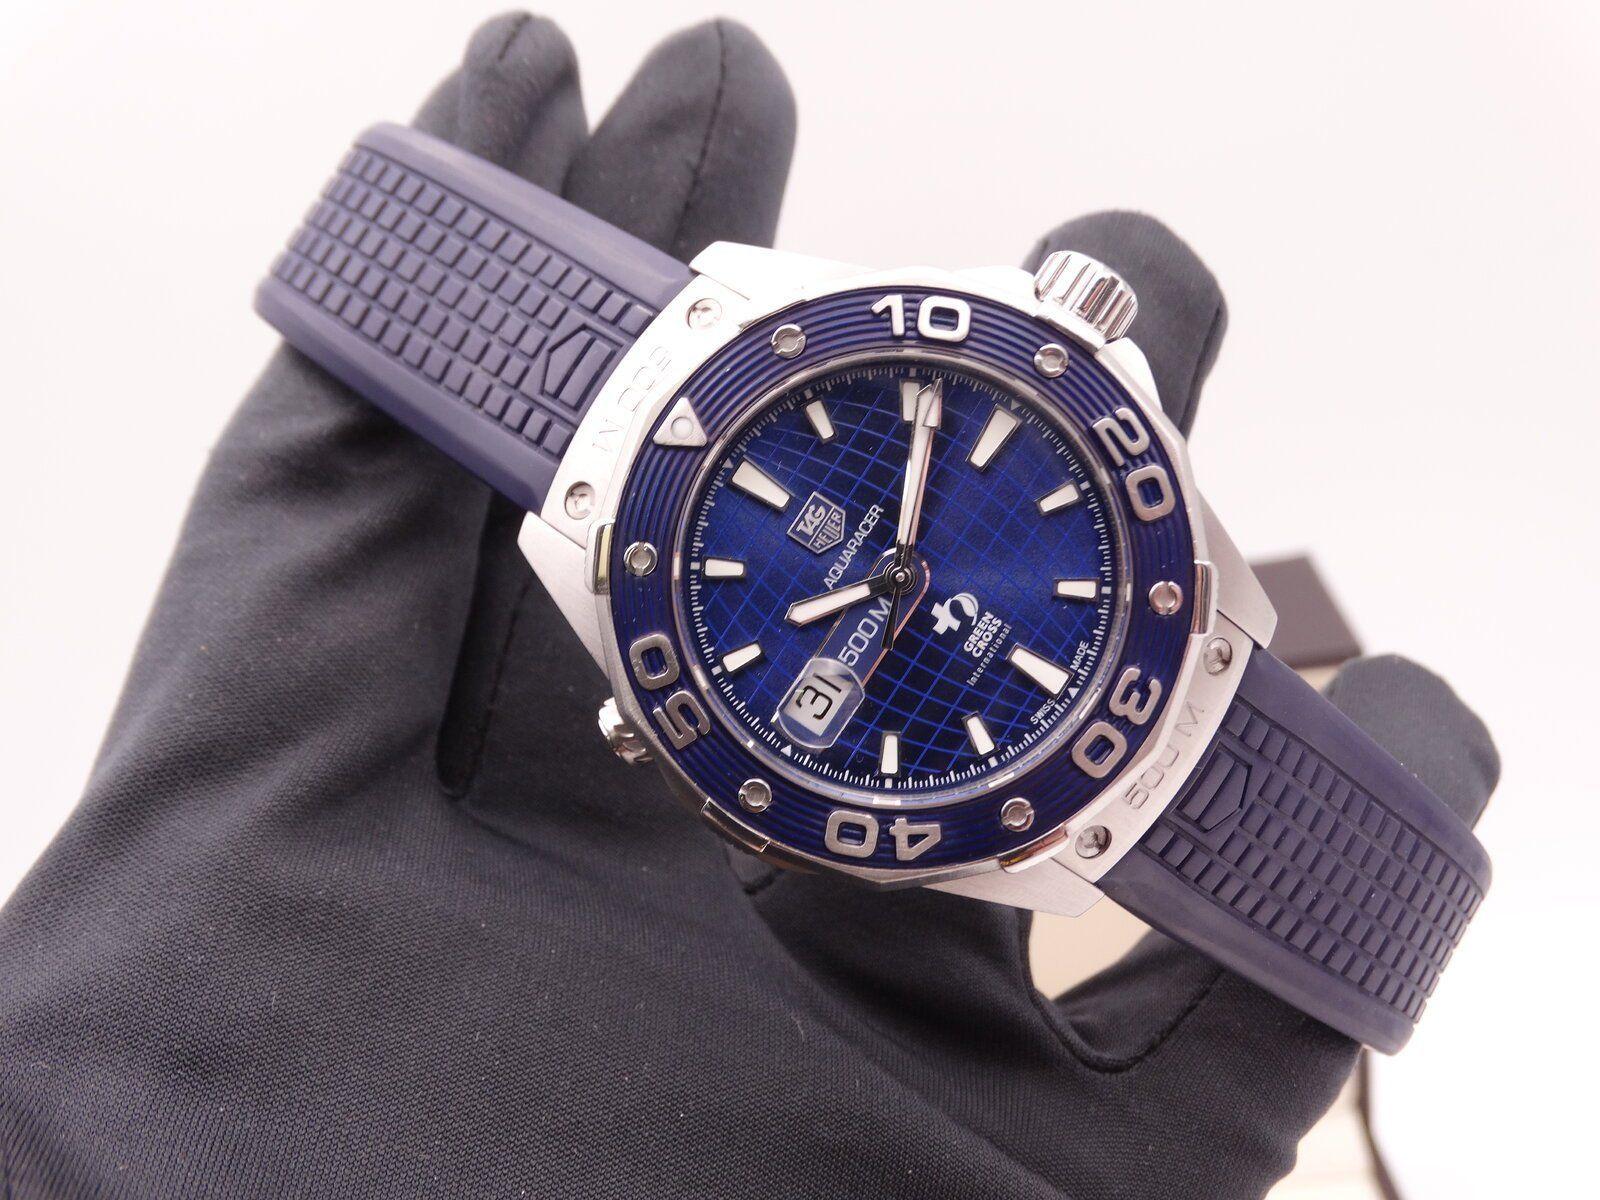 Tag Heuer Aquaracer 500 Dicaprio Green cross Blue Limited 01269.JPG